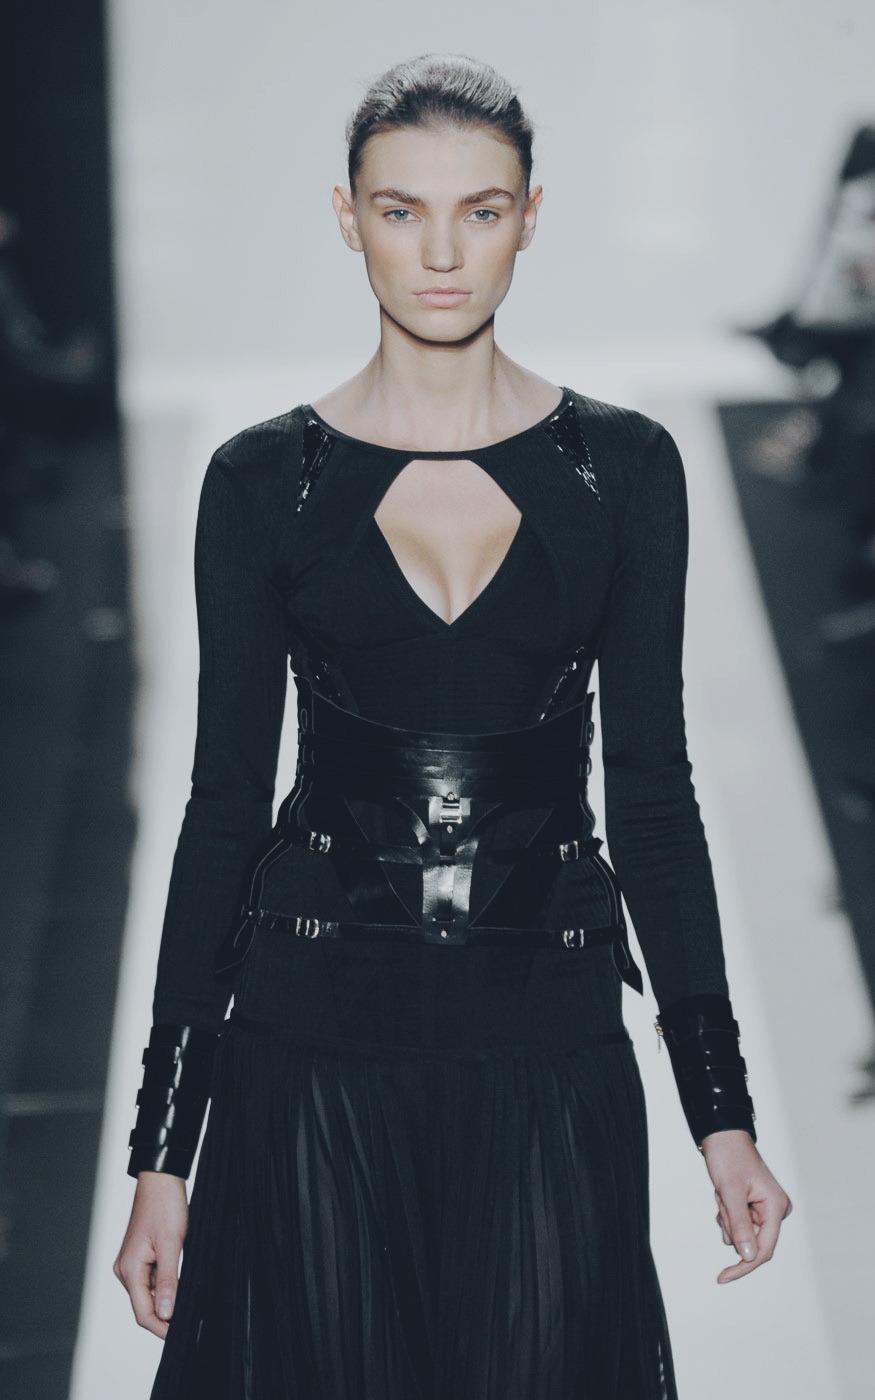 Hervé Léger by Max Azria / Fall 2012 / RTW Model: Daniela Mirzac #herve leger#max azria#daniela mirzac#fashion#Fashion Model#fashion show #ready to wear #runway#runway show